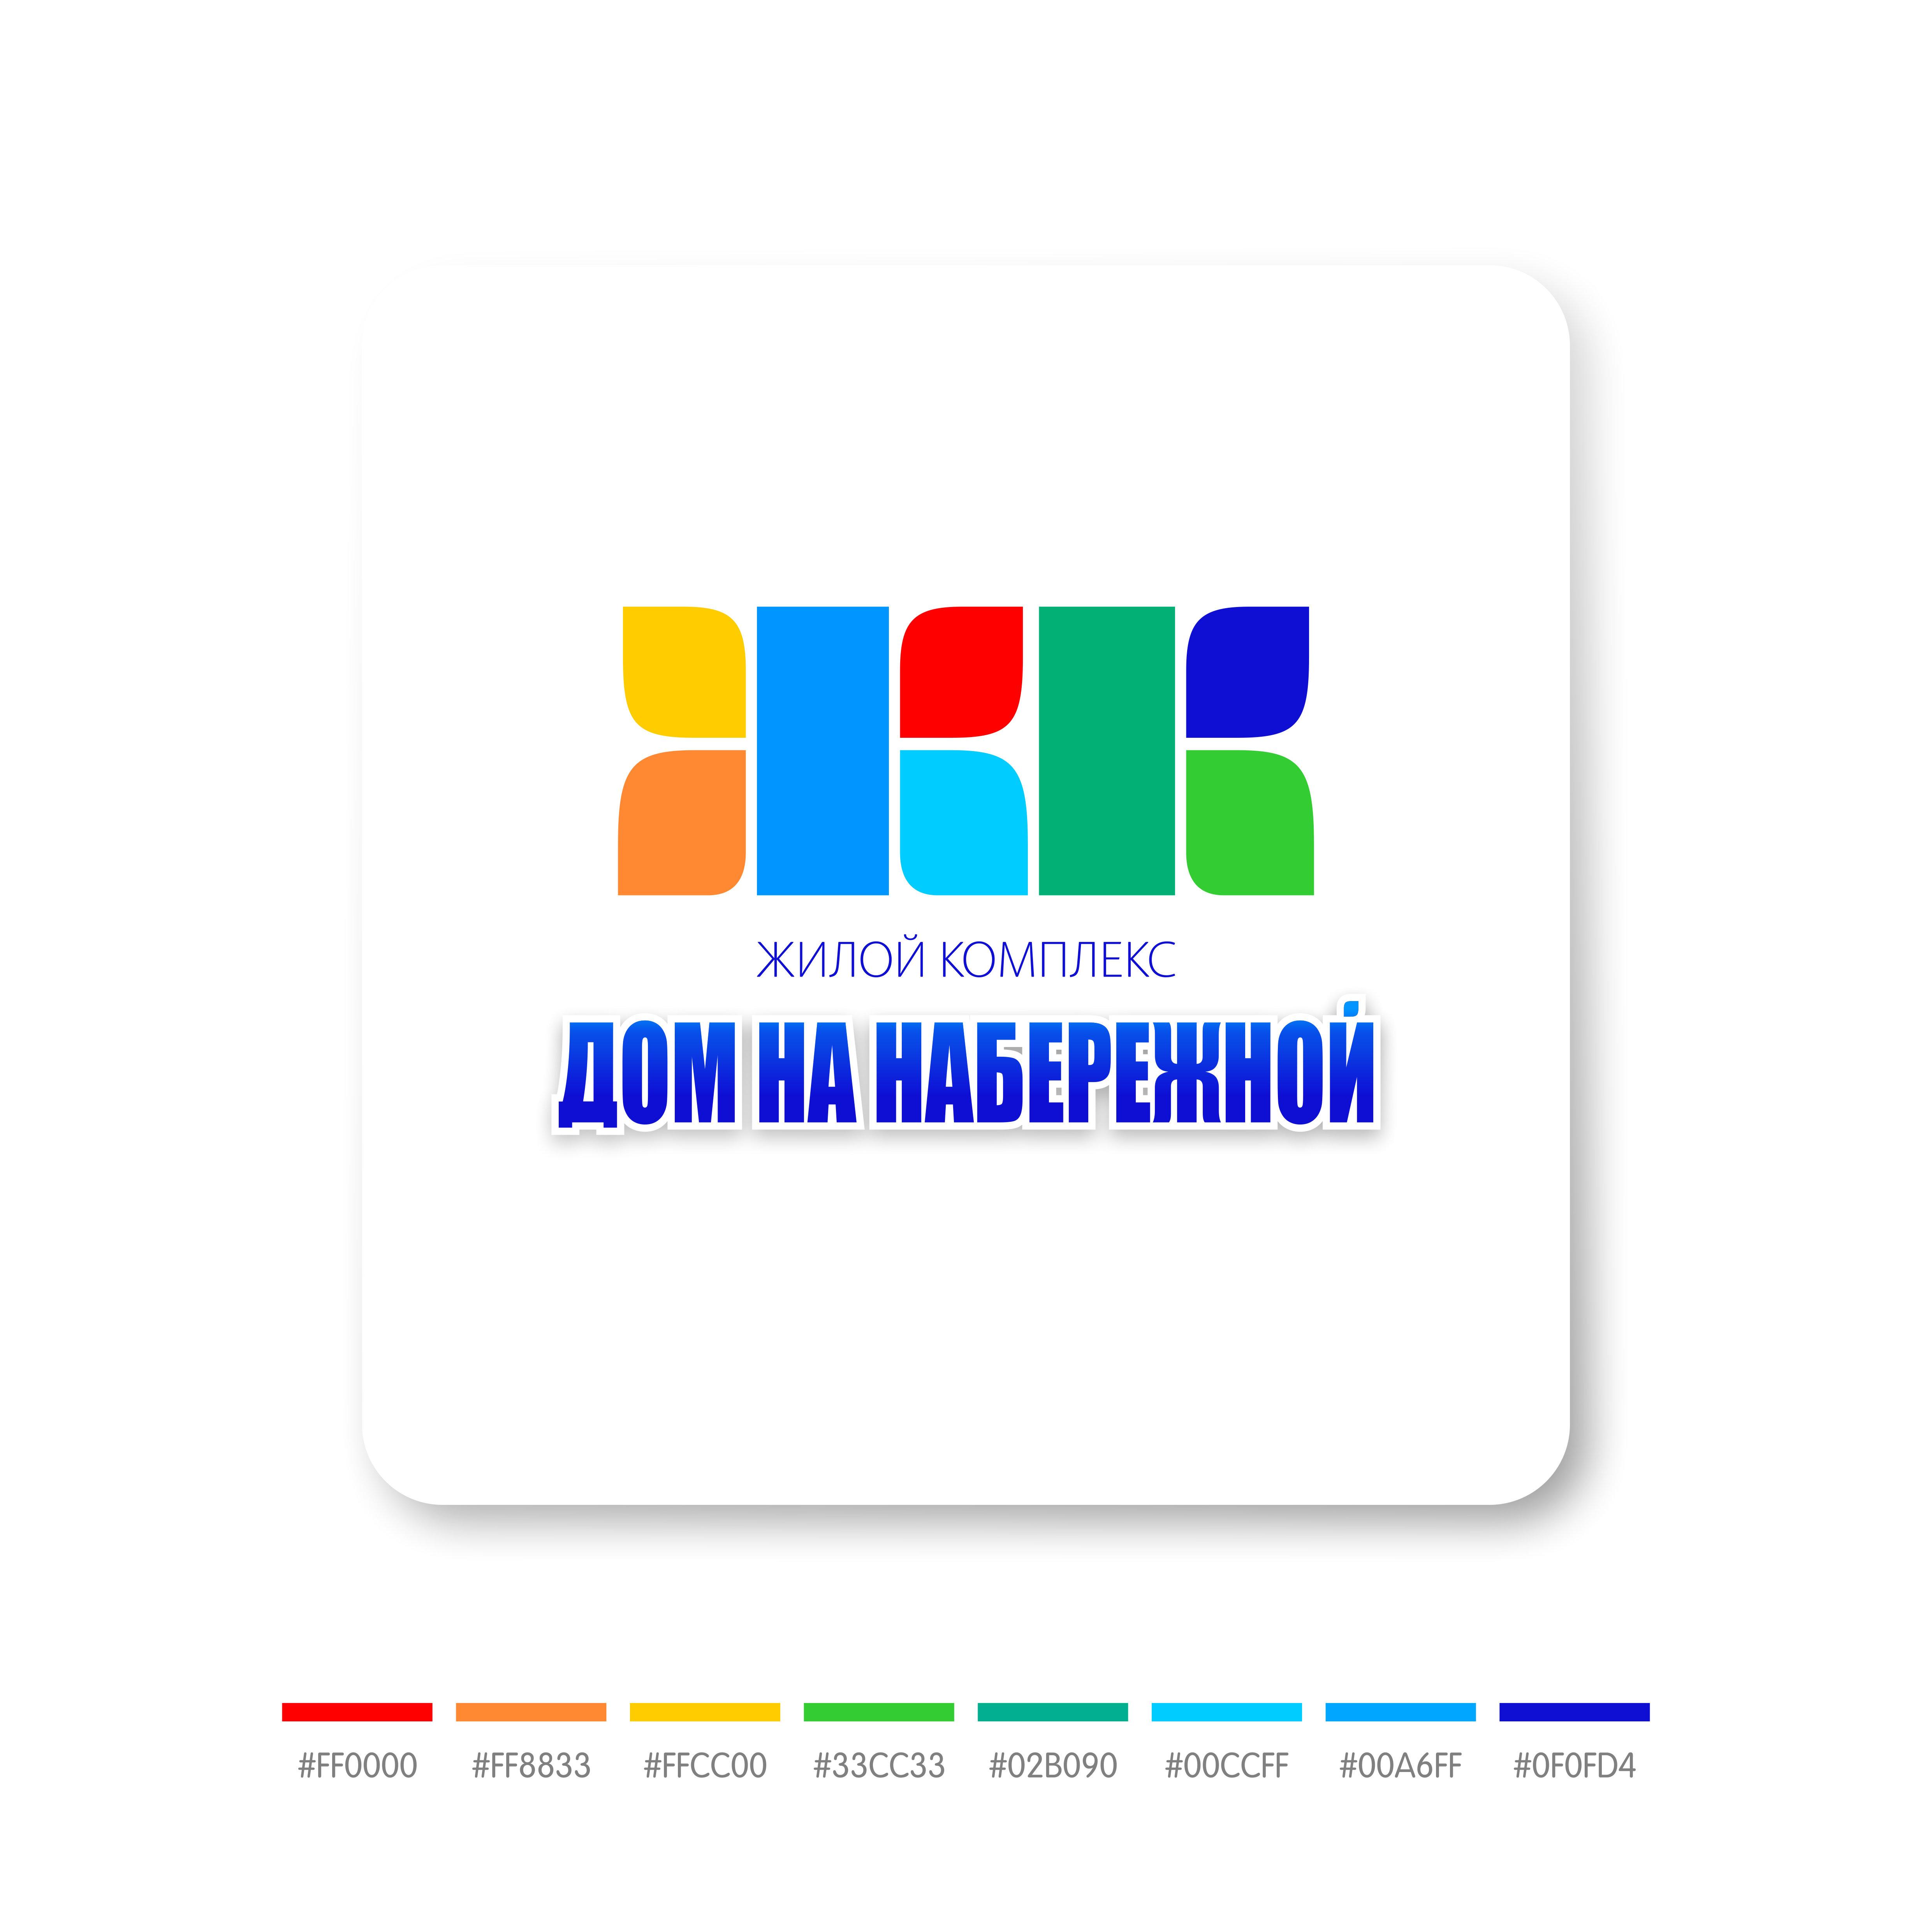 РАЗРАБОТКА логотипа для ЖИЛОГО КОМПЛЕКСА премиум В АНАПЕ.  фото f_6105deb7689890ed.jpg